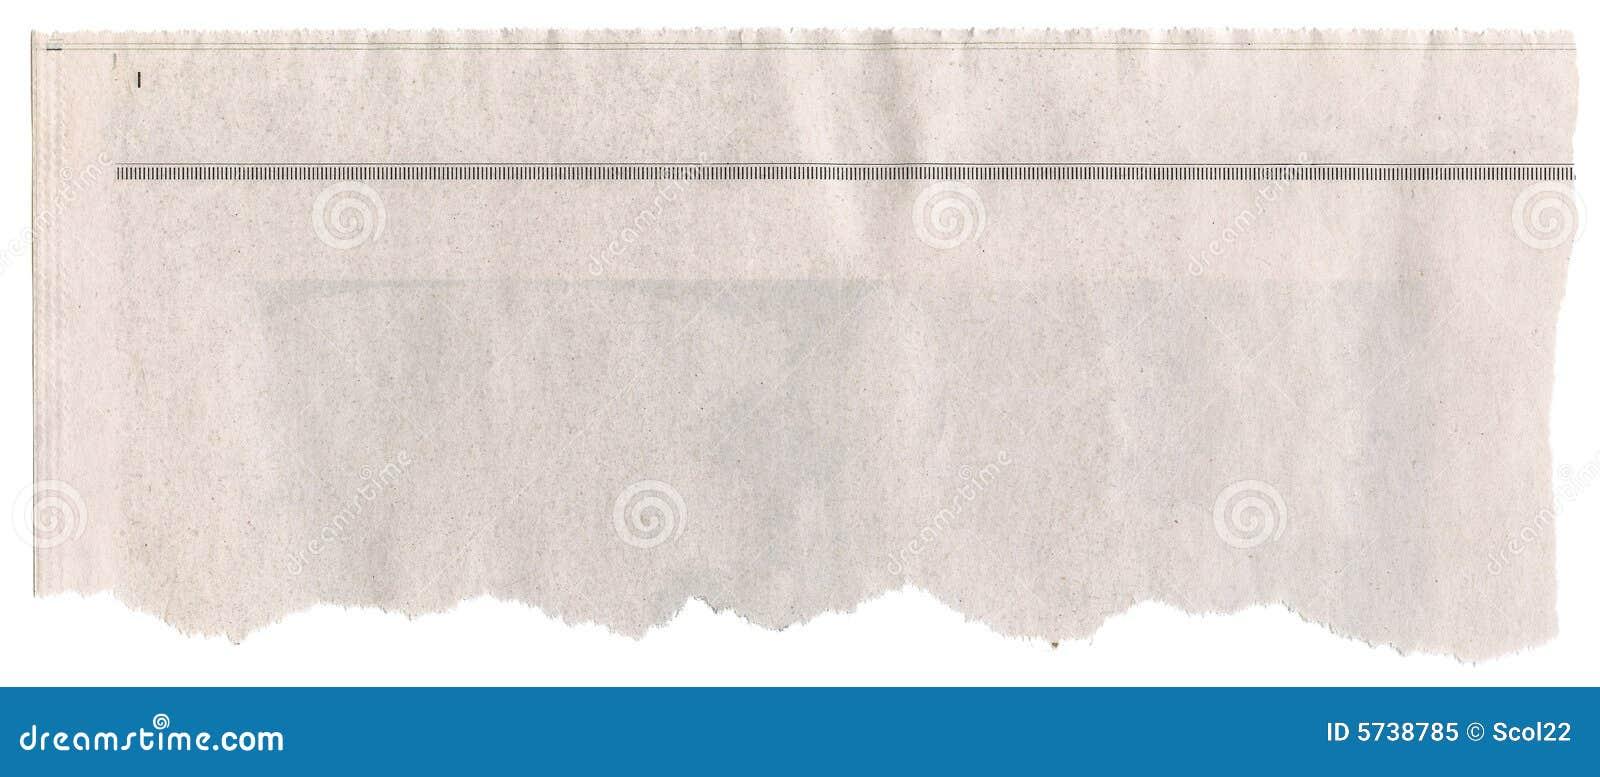 newspaper template blank